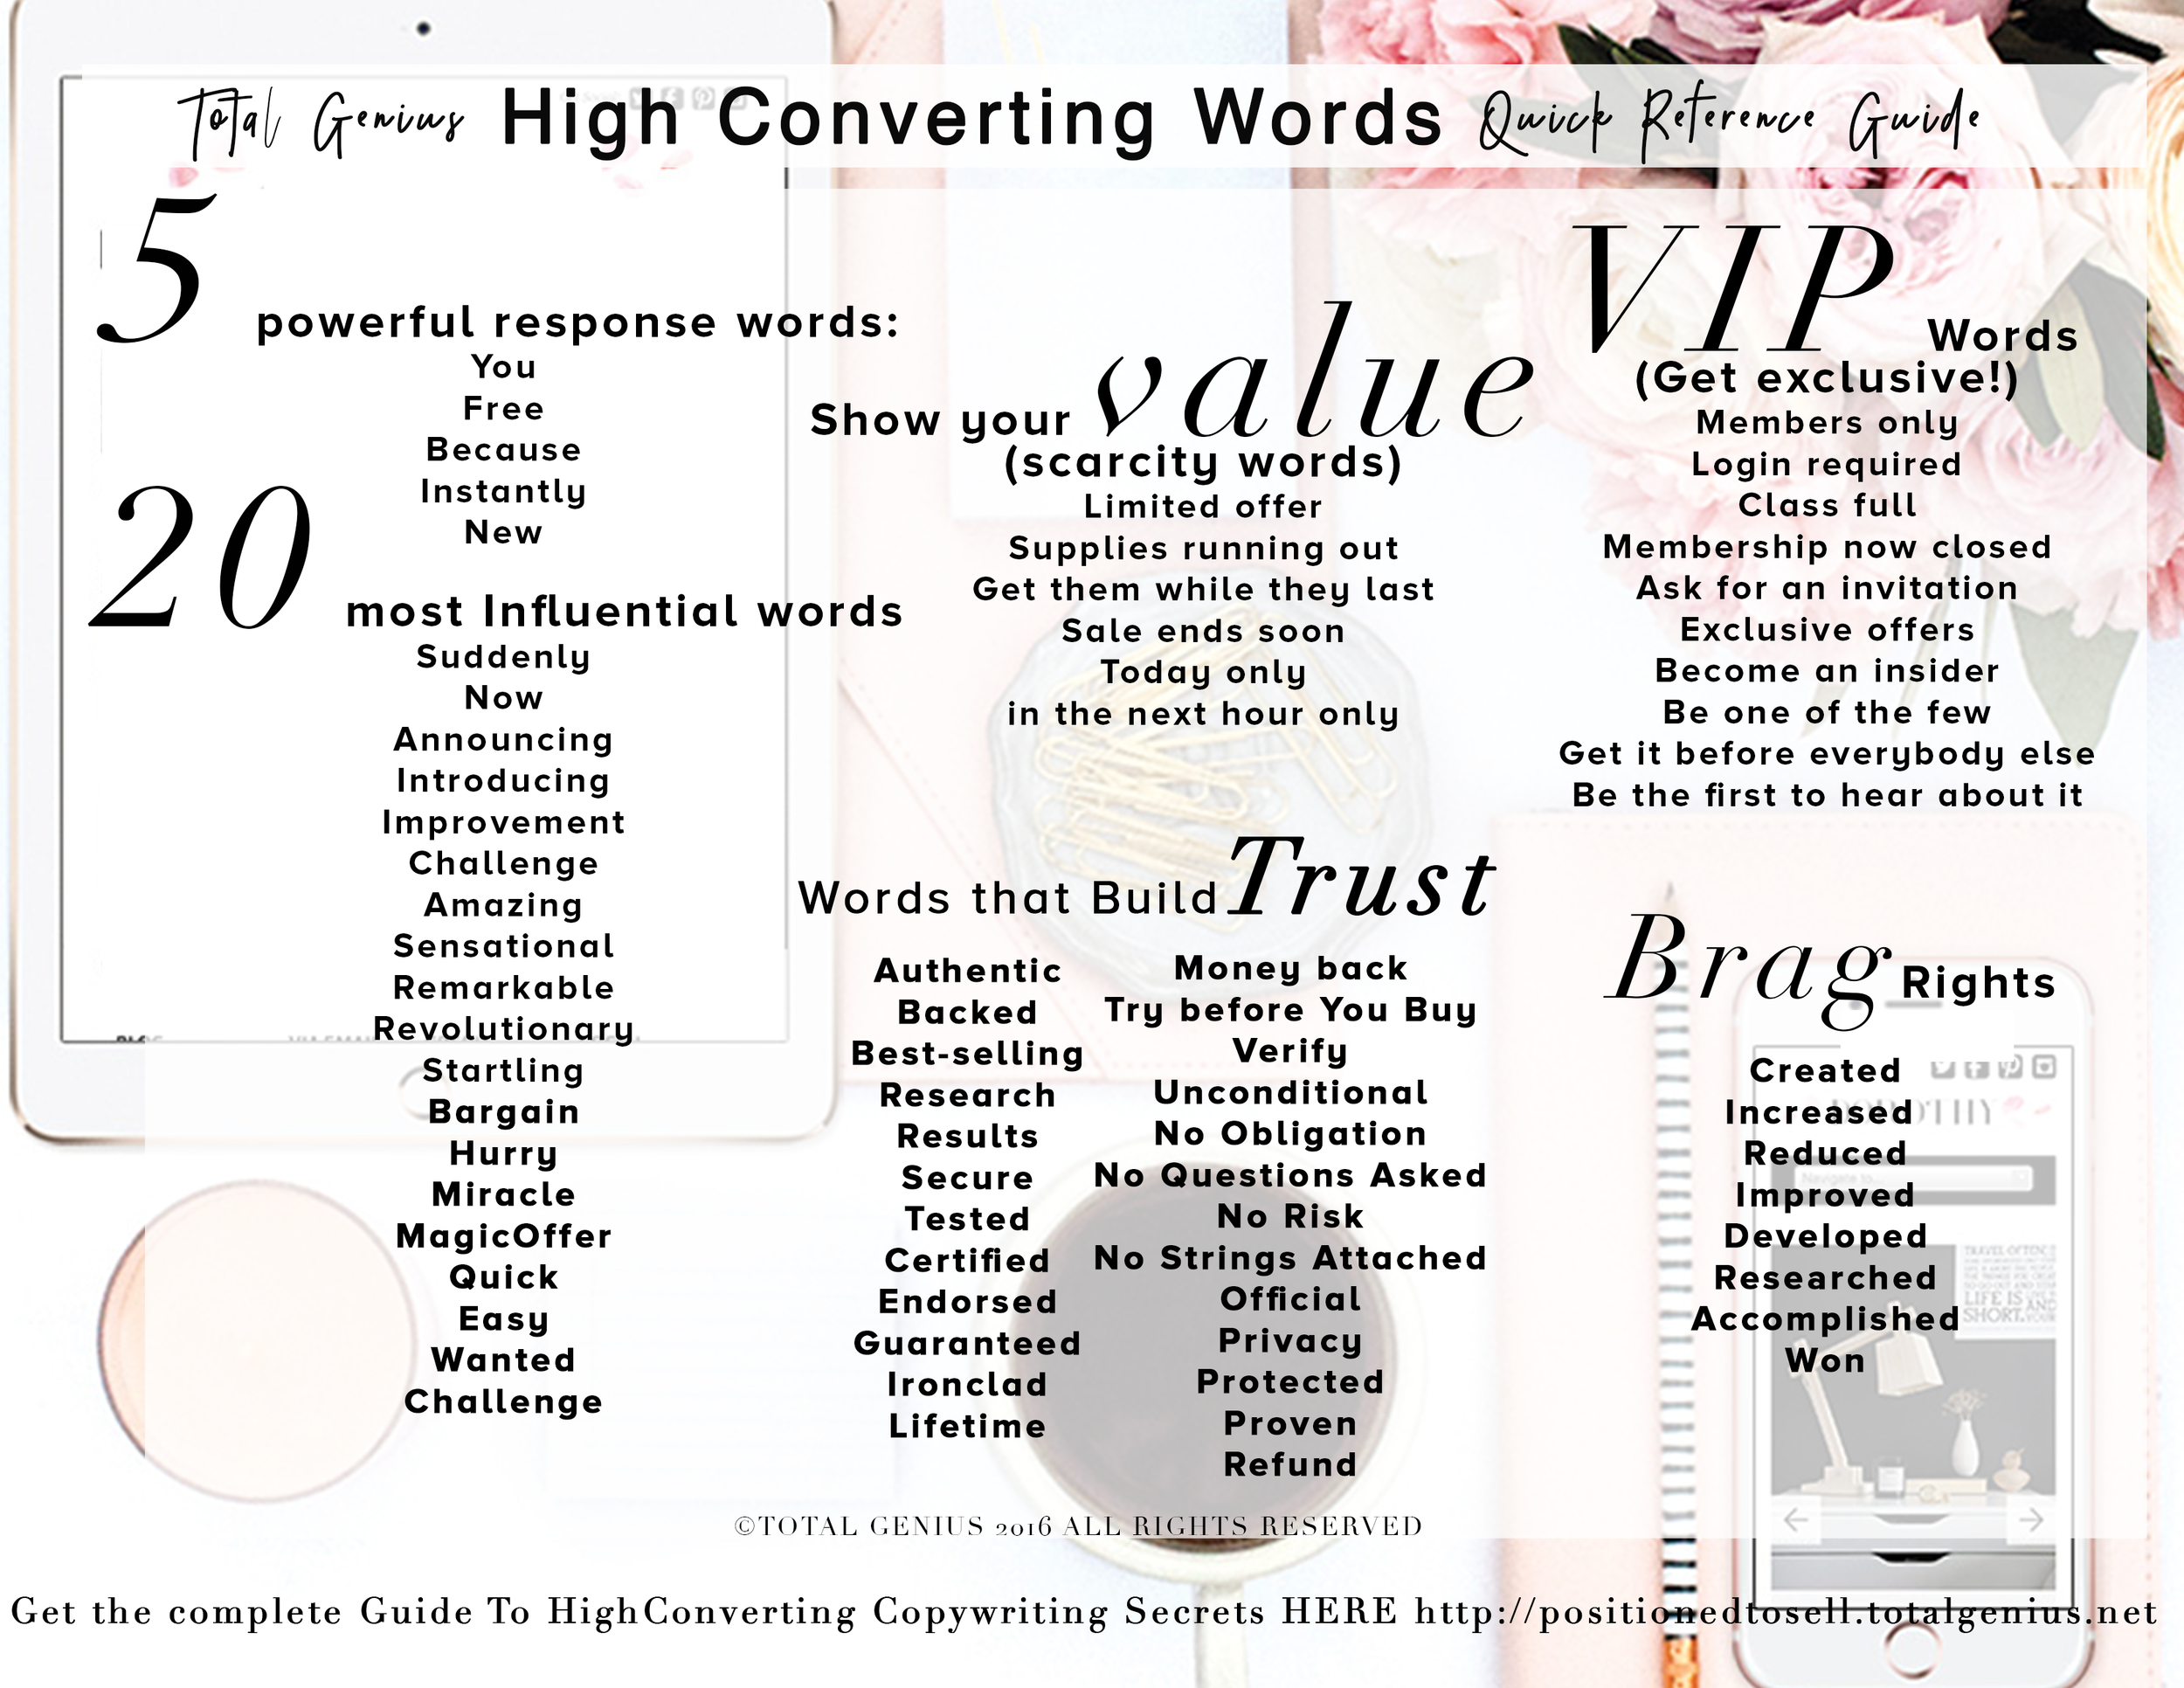 Total Genius Words Guide